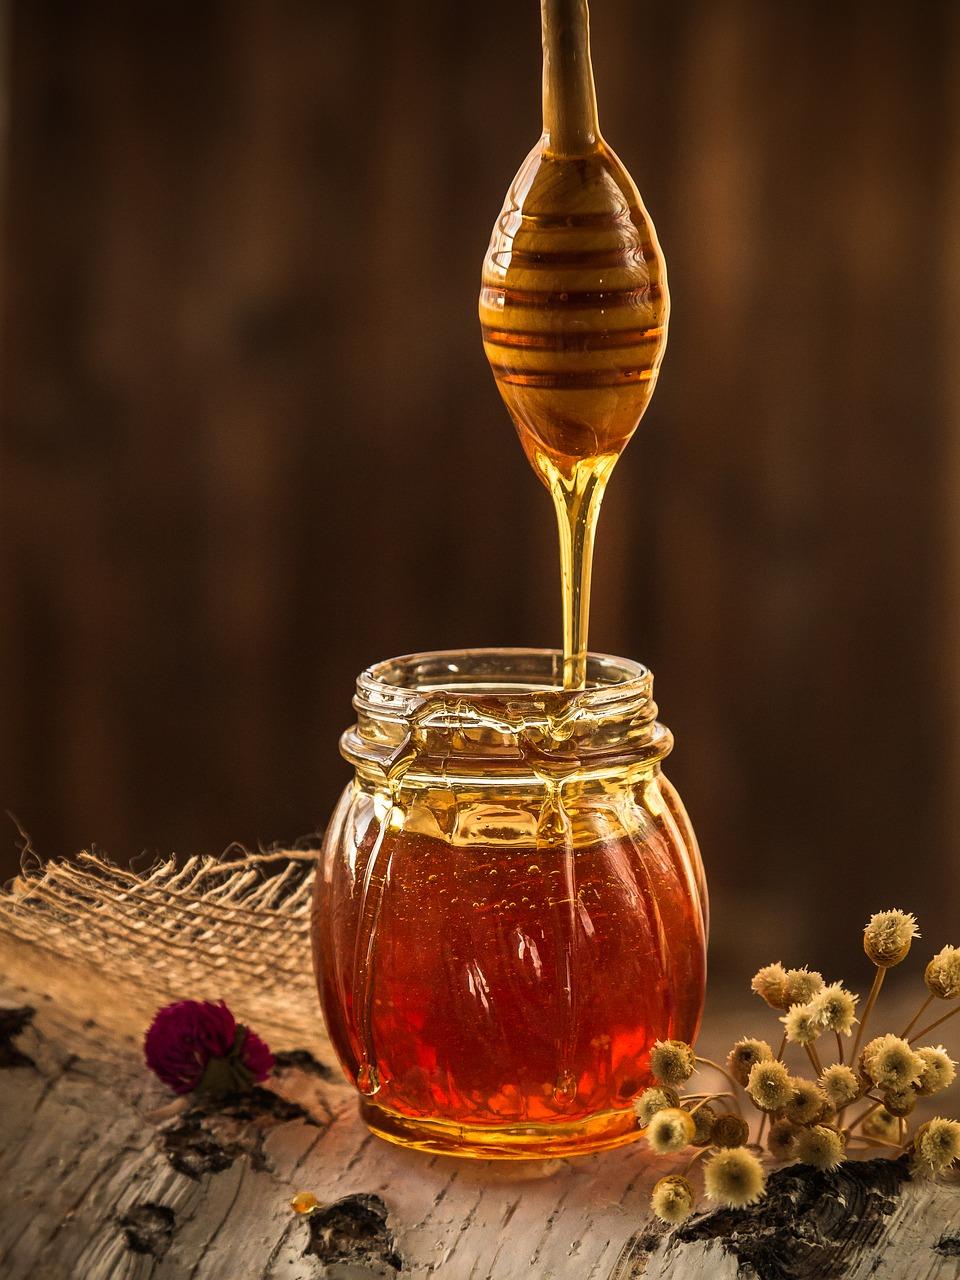 Nature-Beekeeper-Honey-Flower-Pollen-Yellow-1958464.jpg